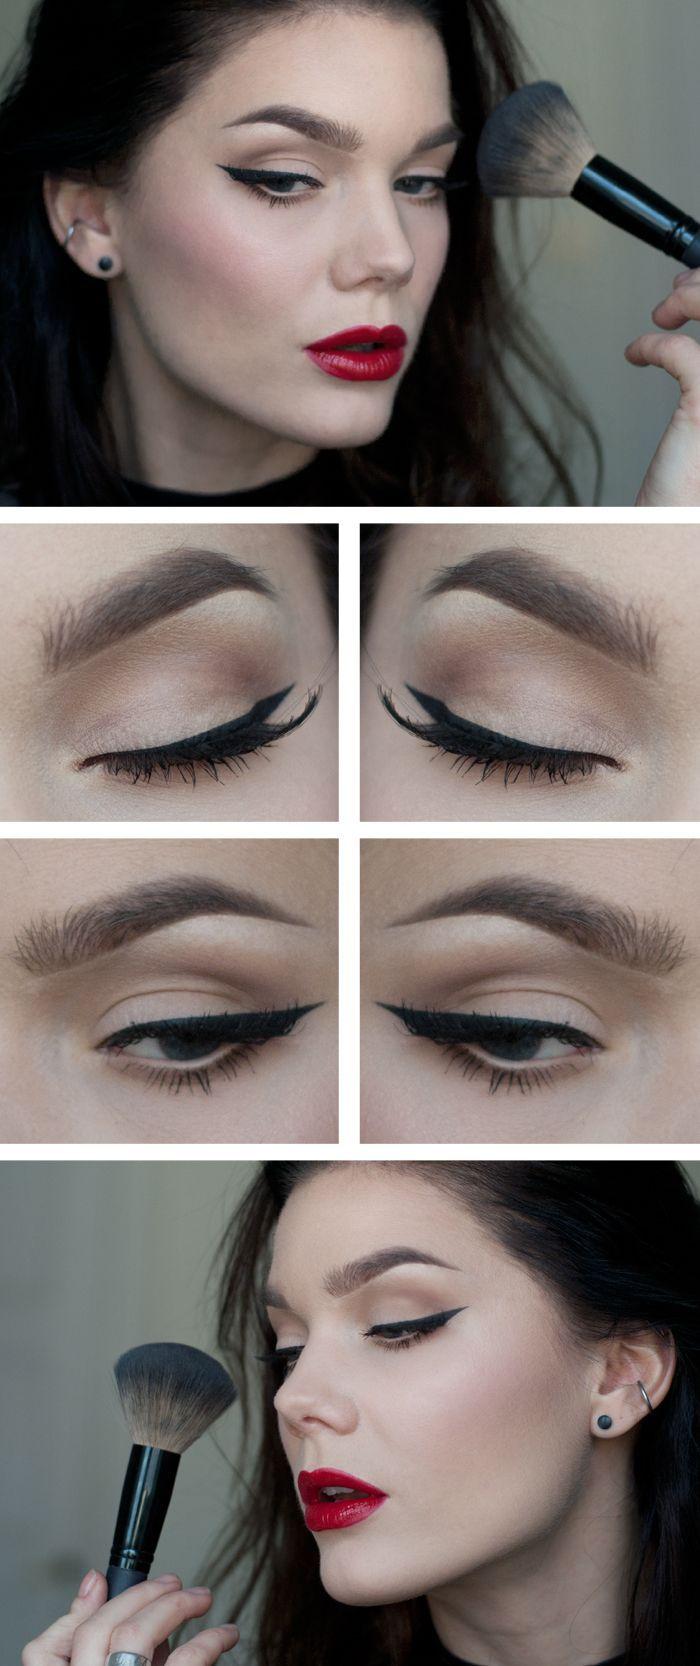 Best make up images on pinterest beauty makeup makeup ideas